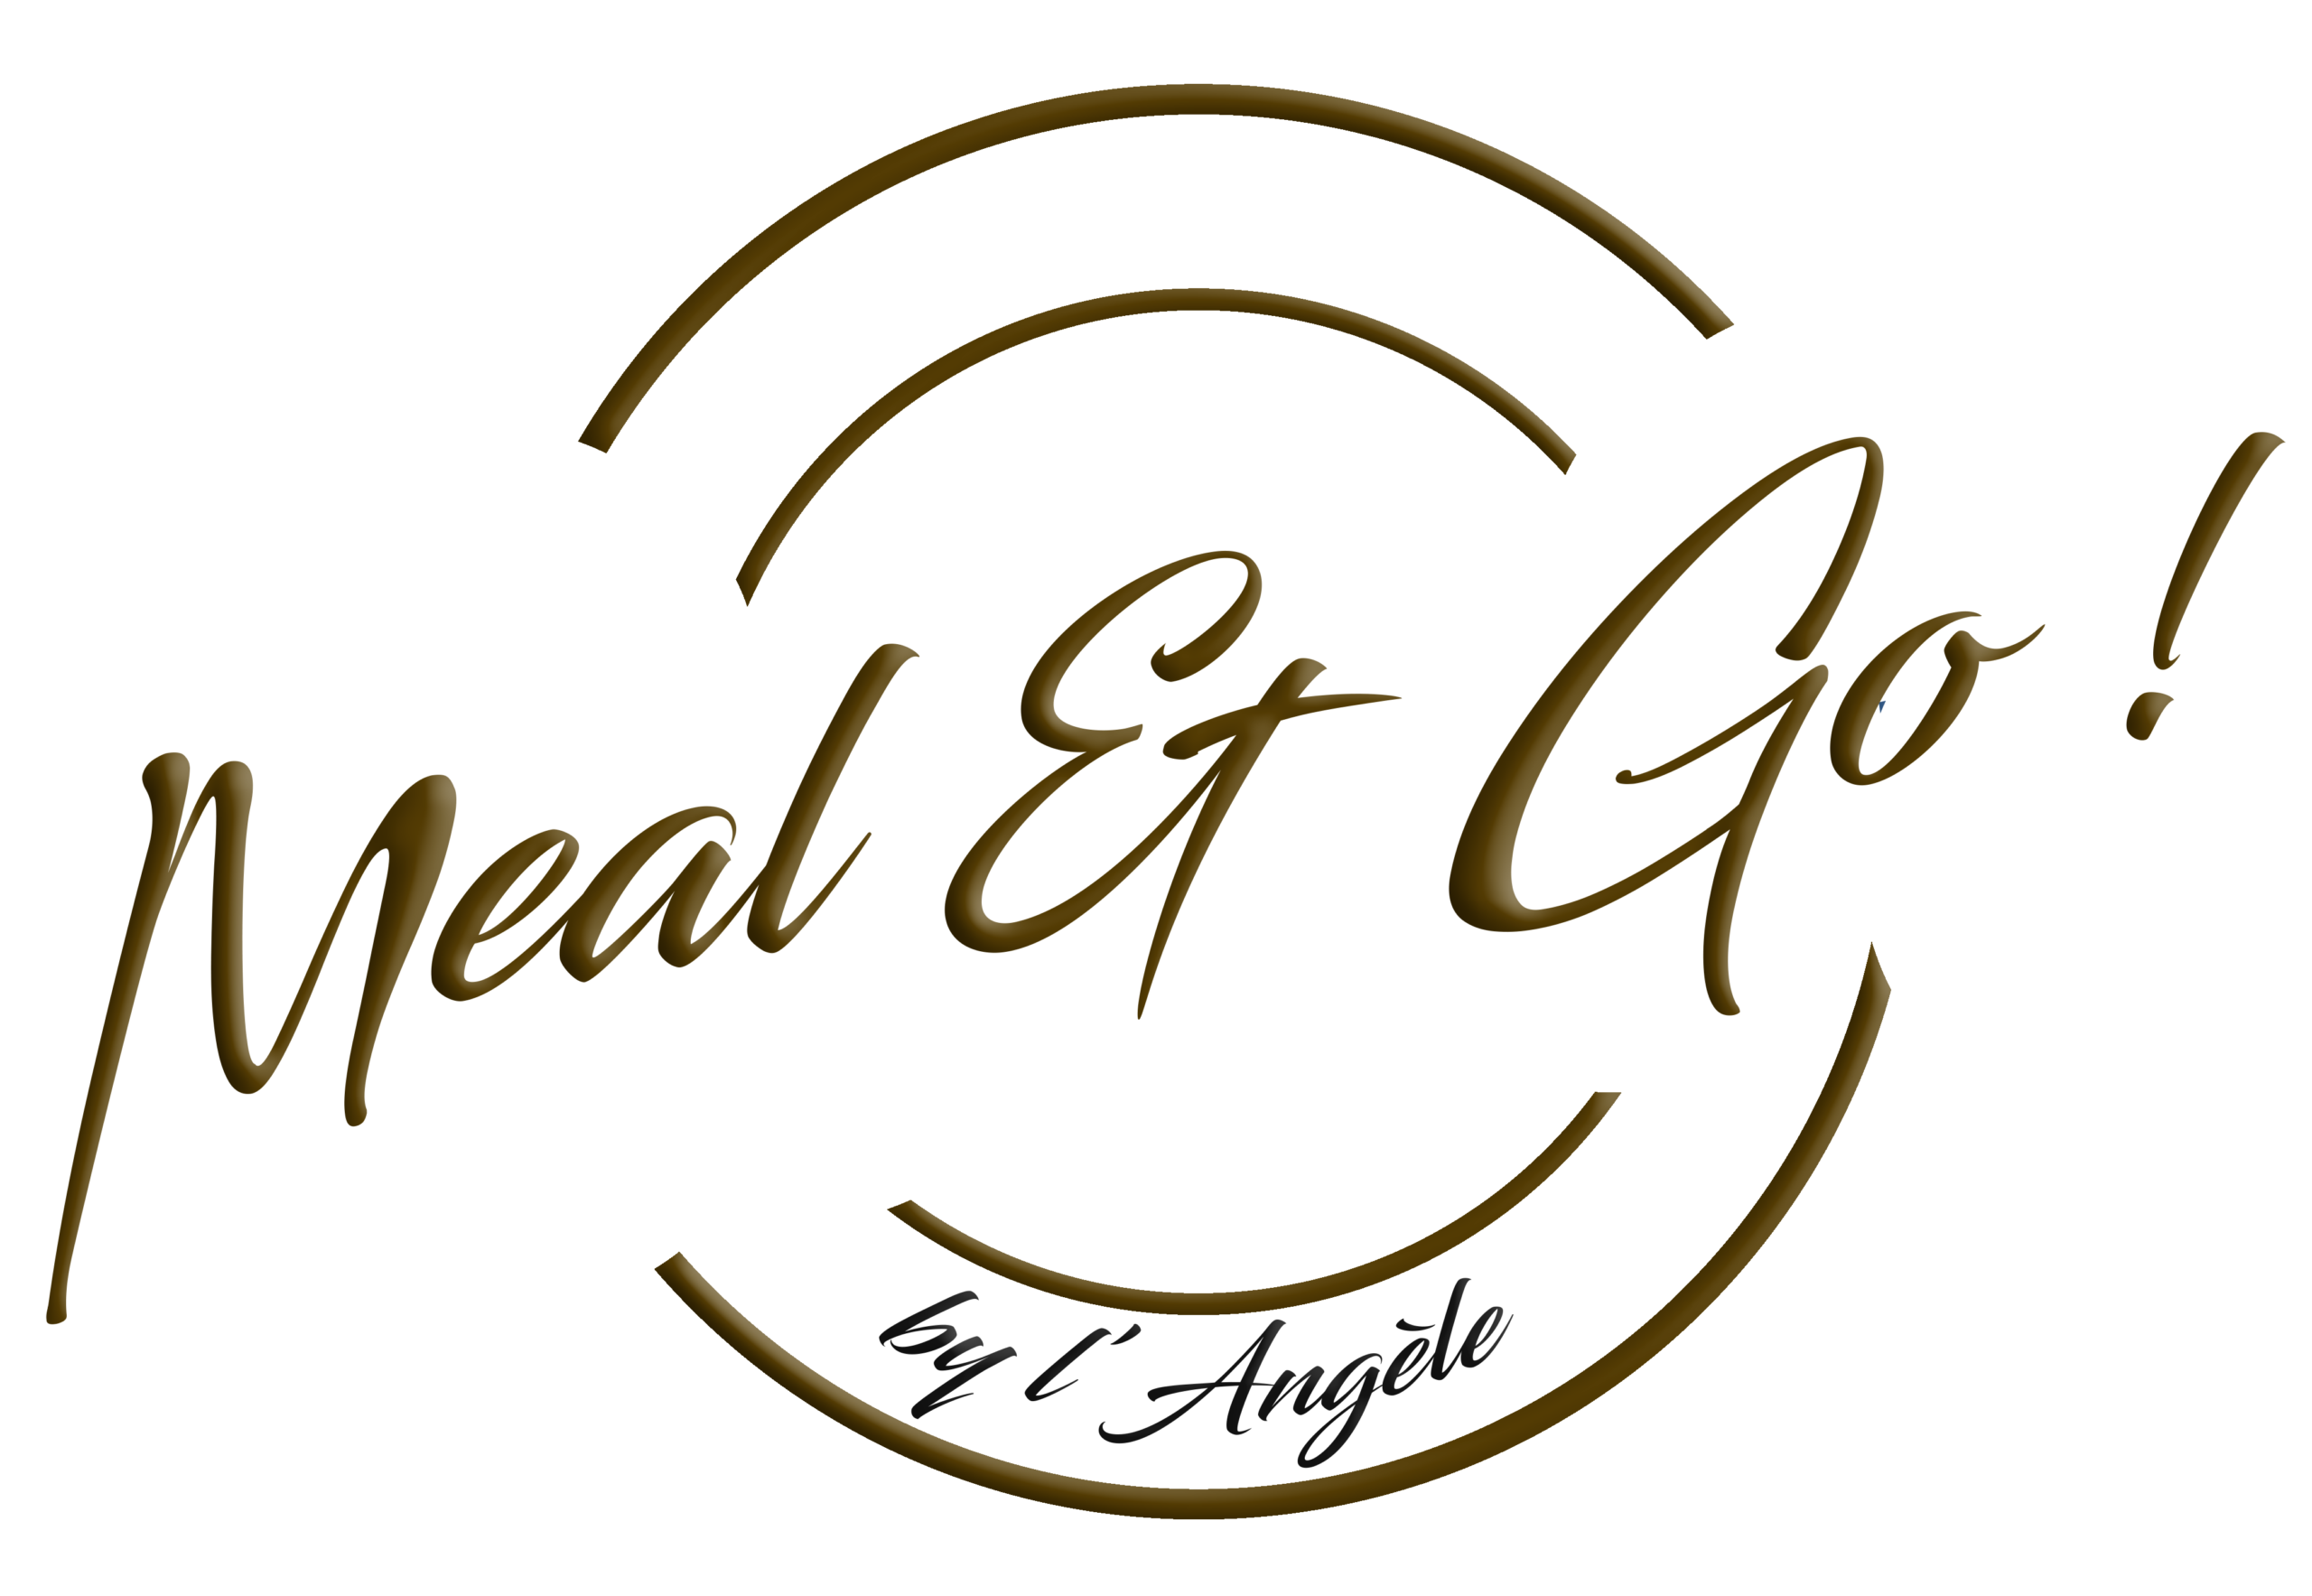 Repas à domicile Meal and Go !